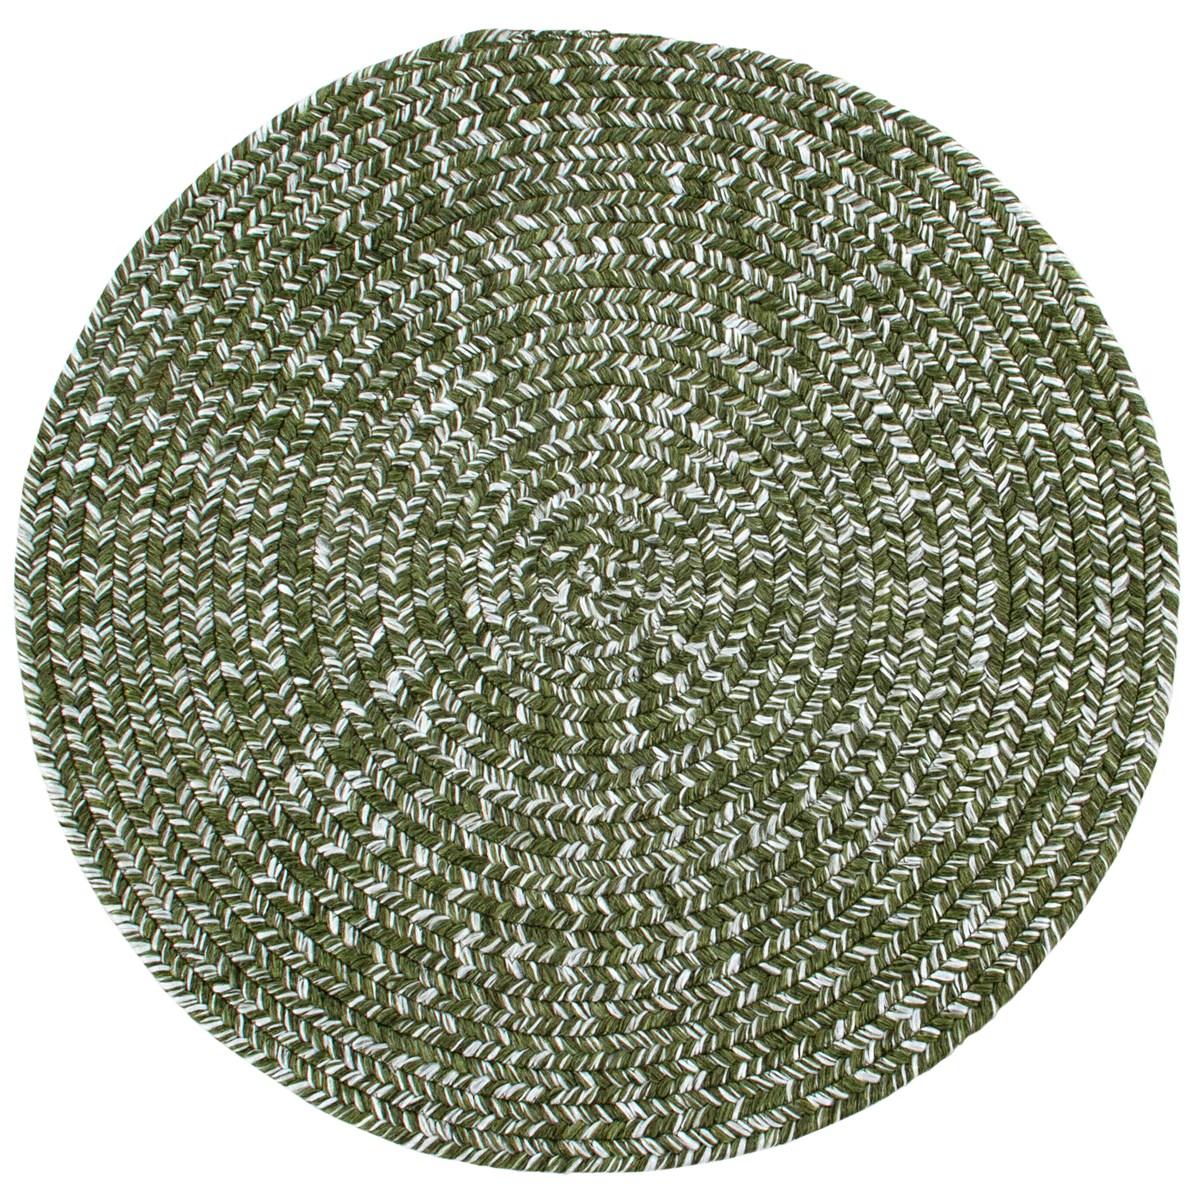 Tapis de salon en Polypropylène Vert olive 60x120 cm